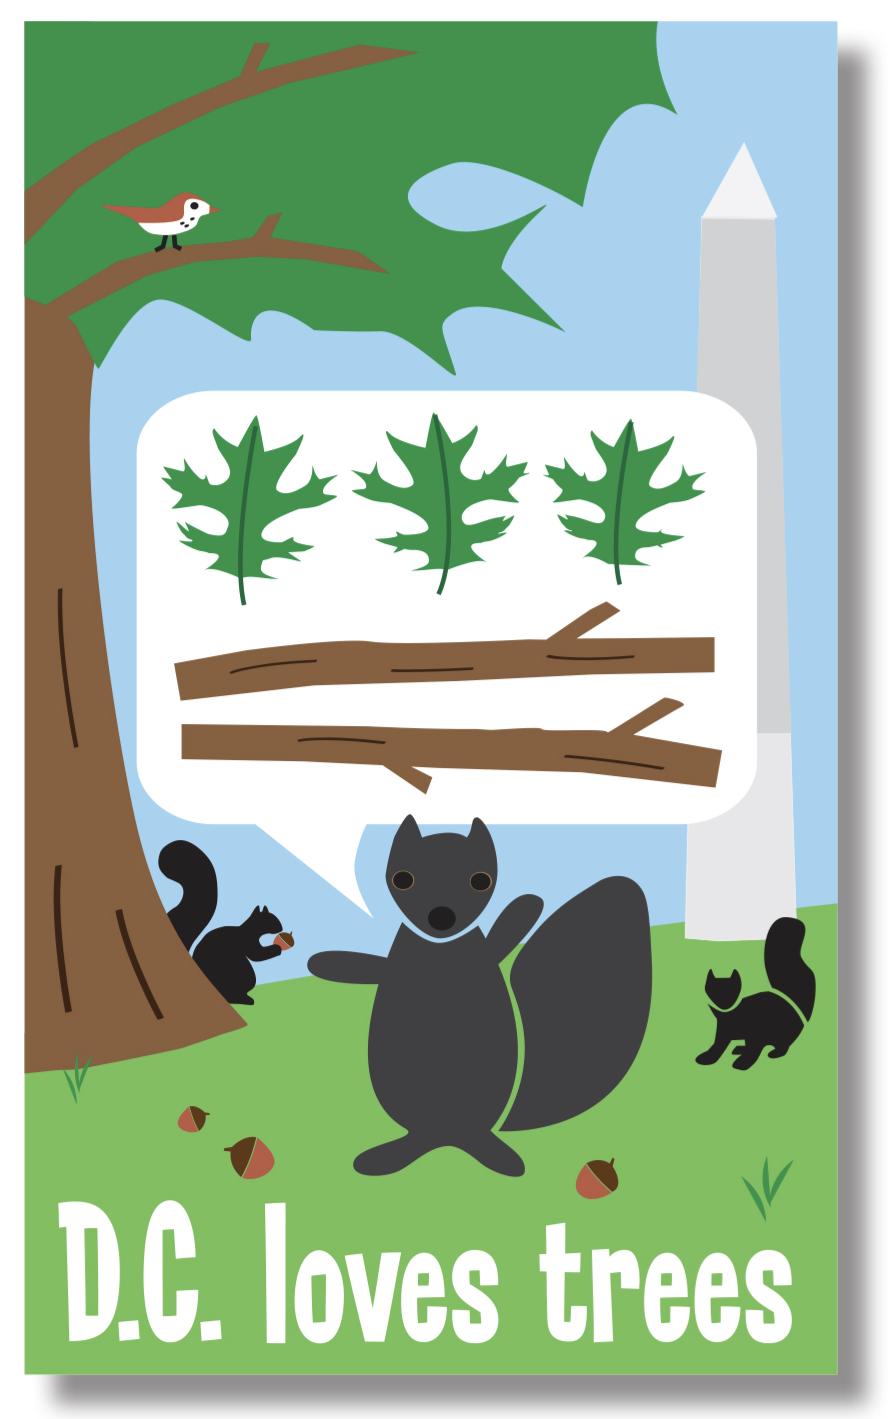 squirrel poster_edited